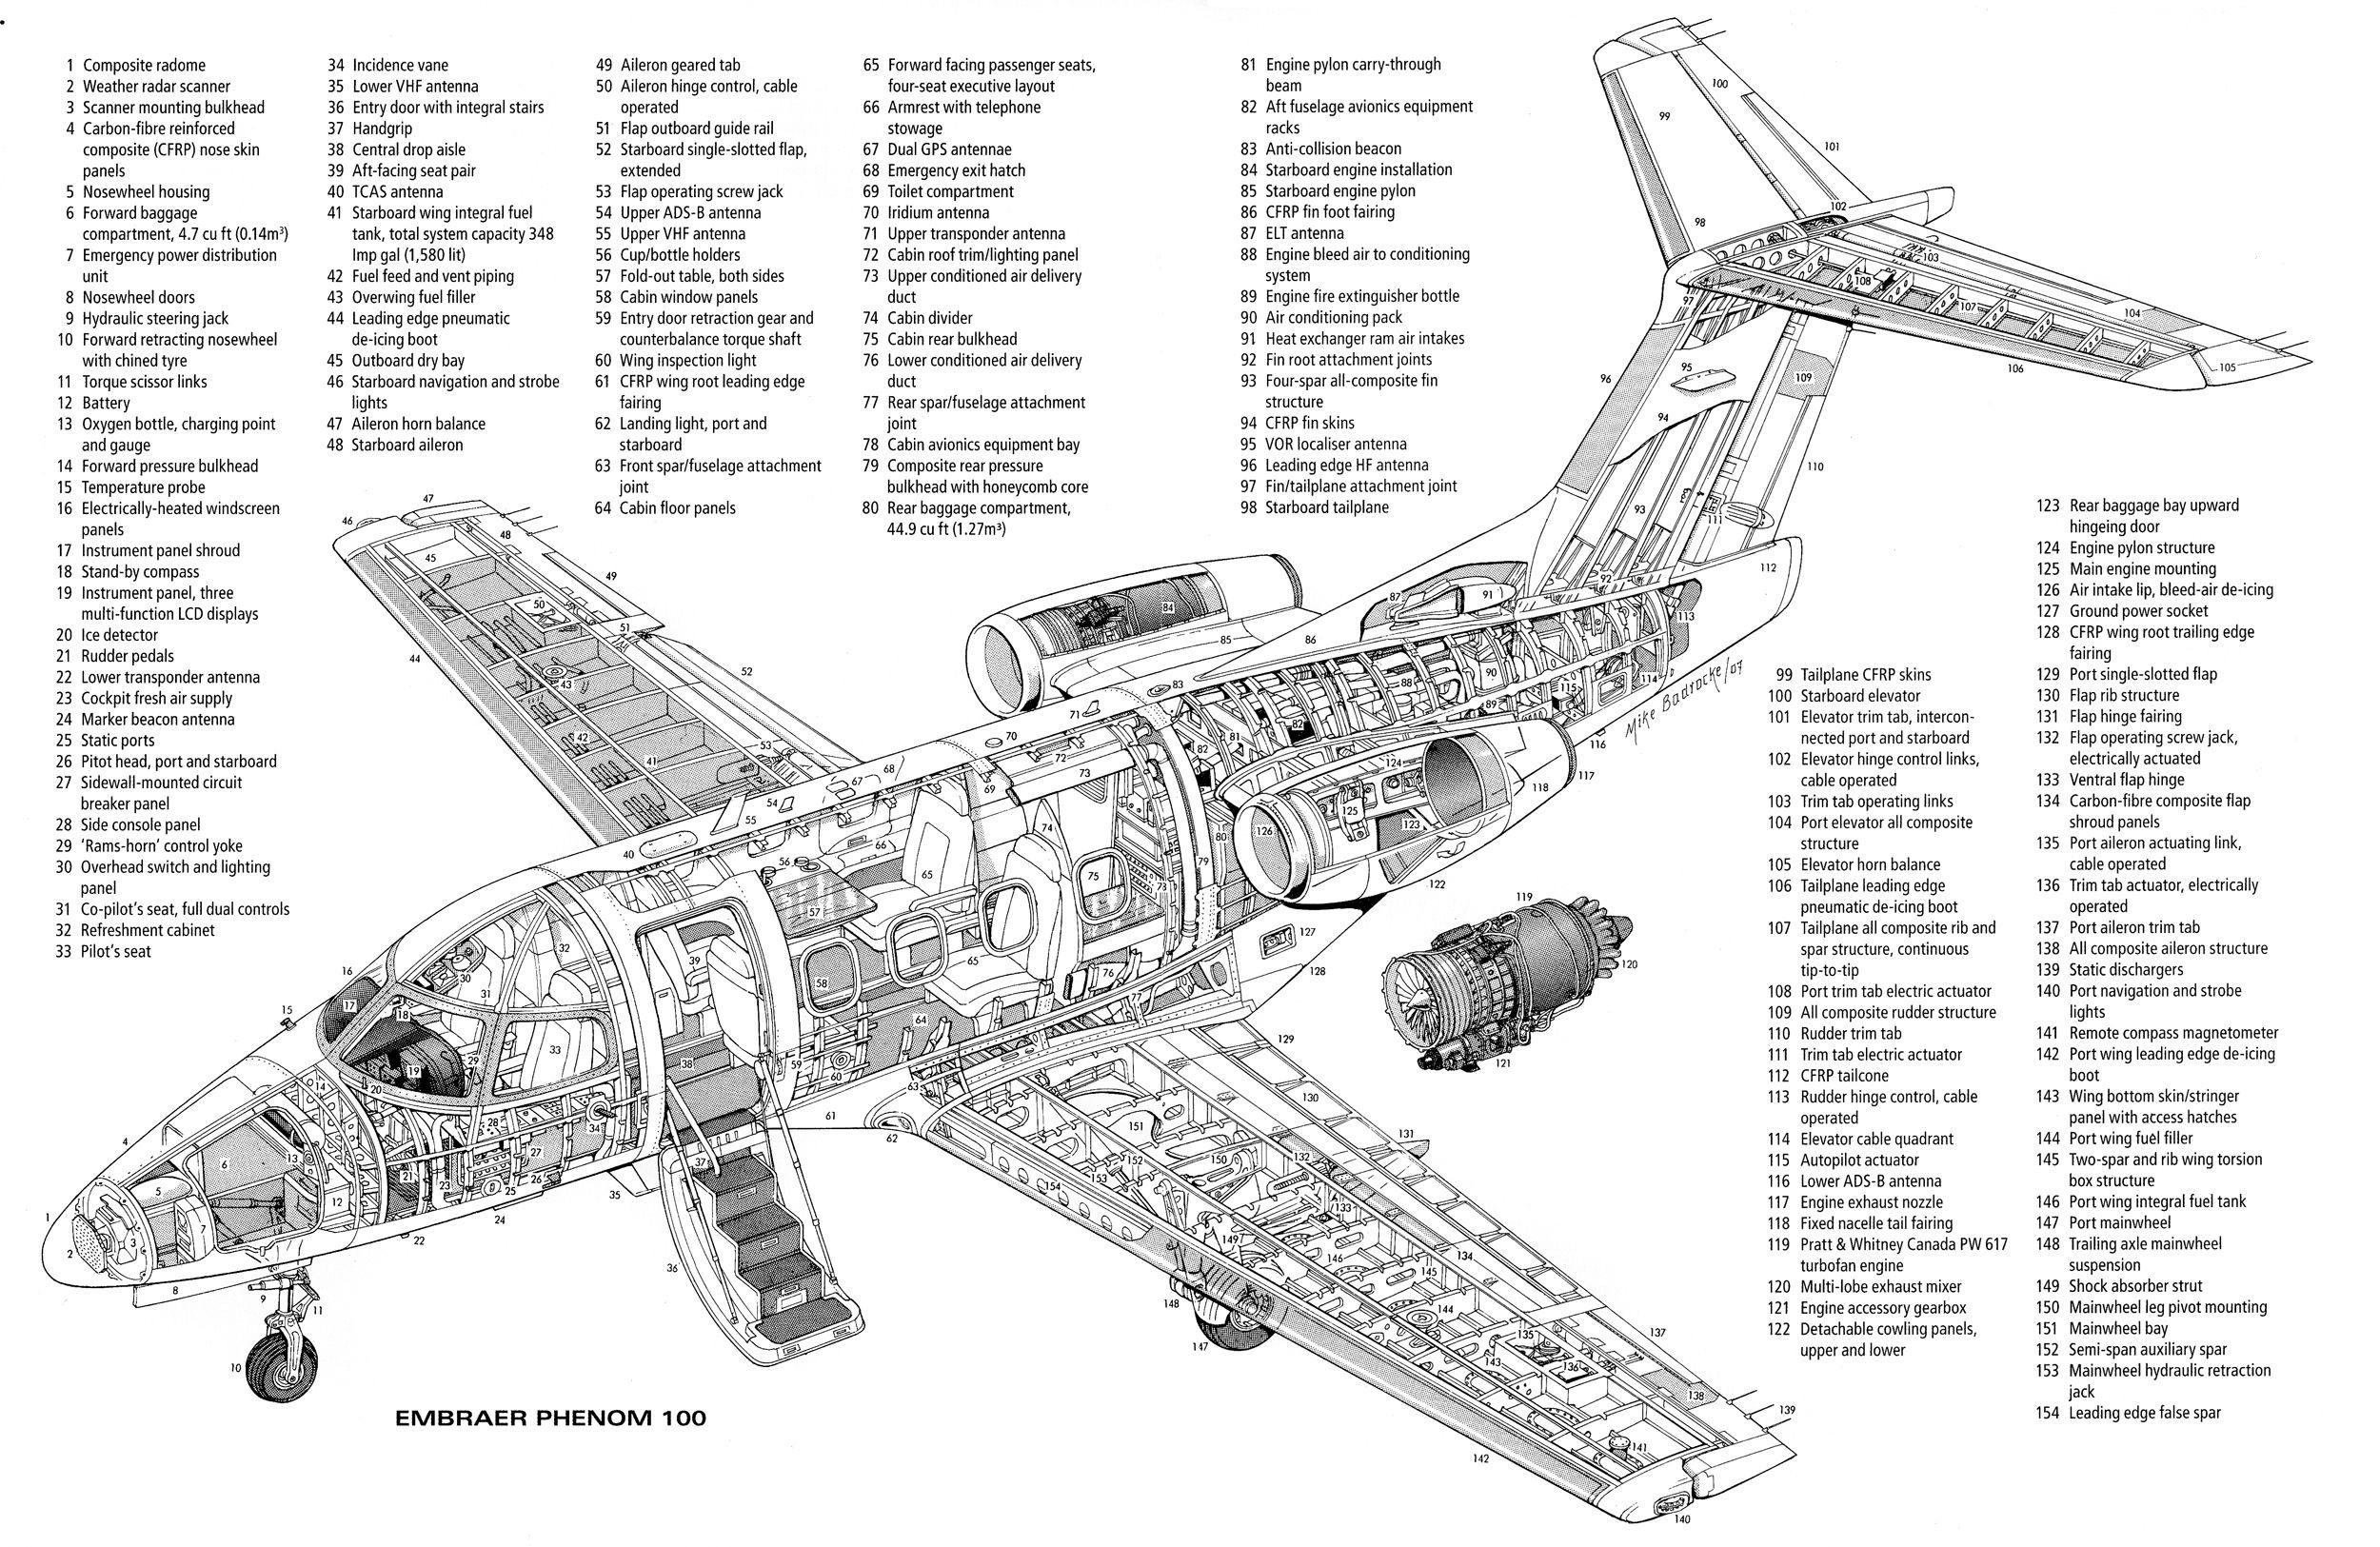 aircraft engineering order